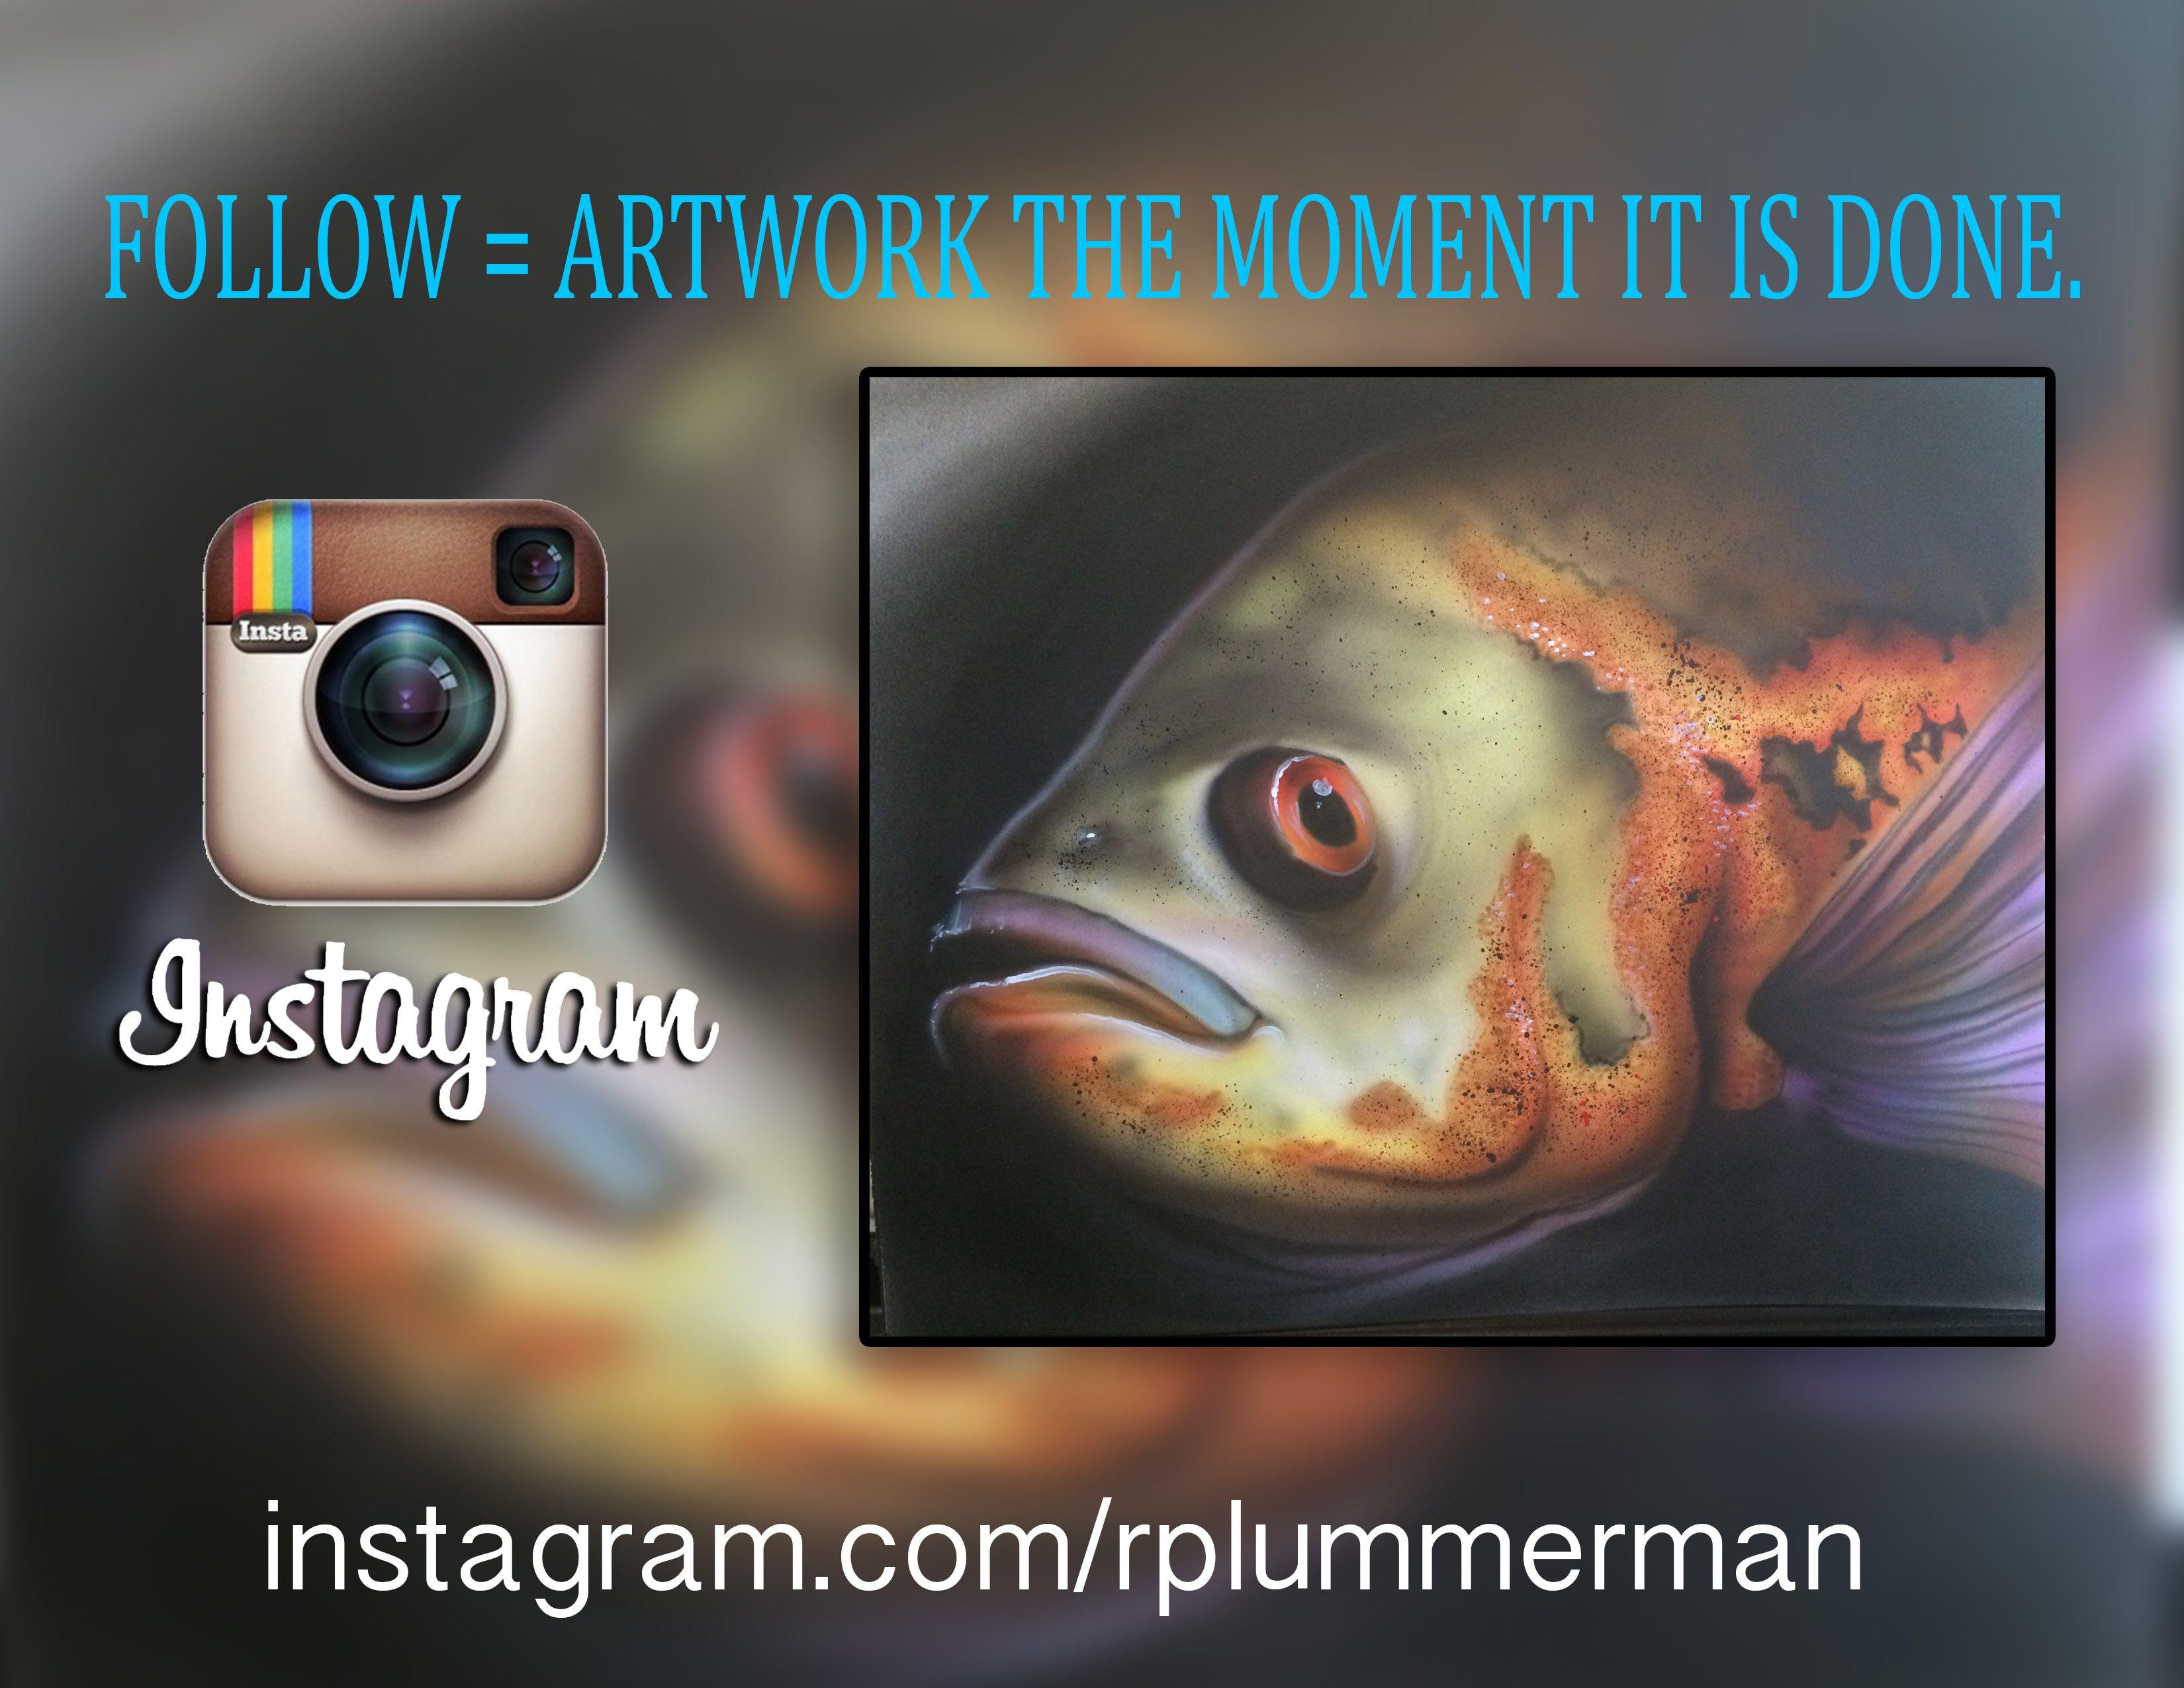 promo for Instagram